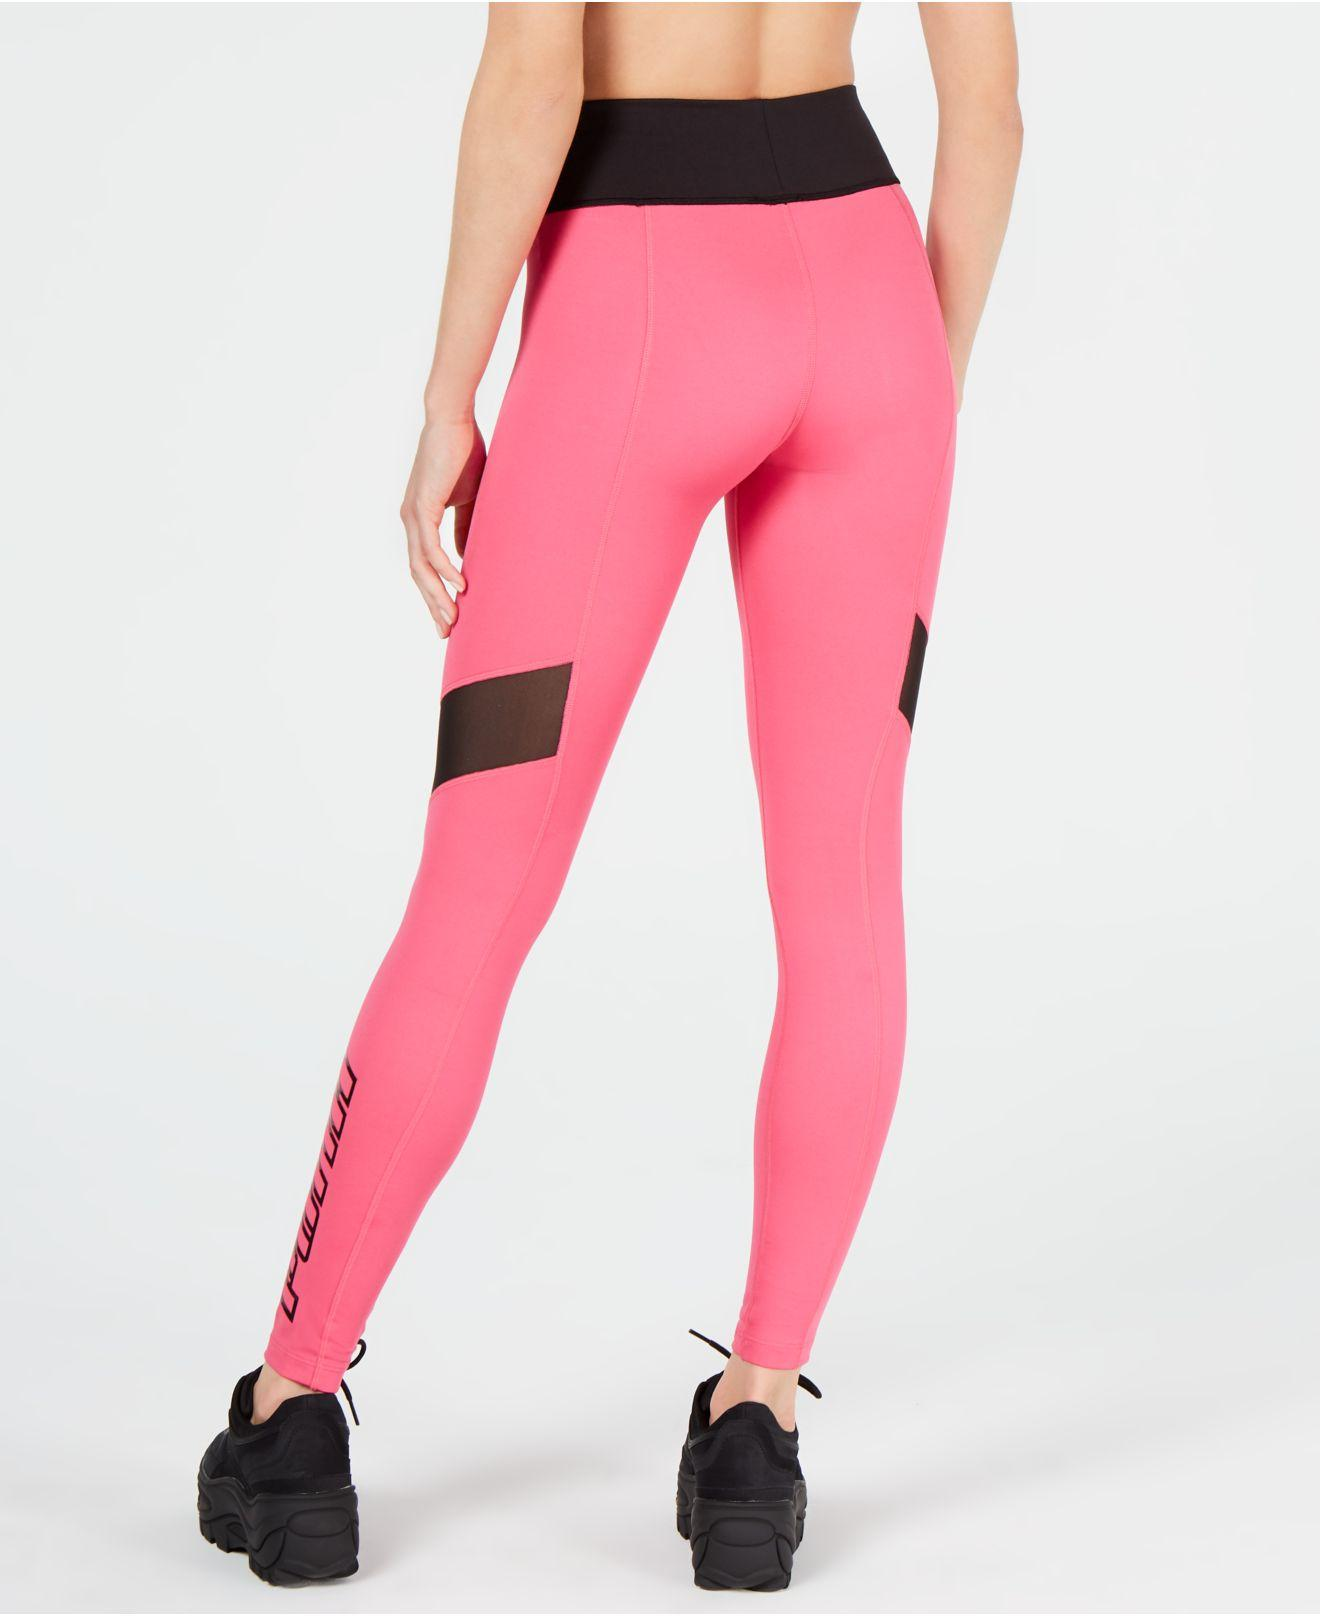 c5cda57e5d395b Lyst - PUMA Tz High-waist Logo Leggings in Pink